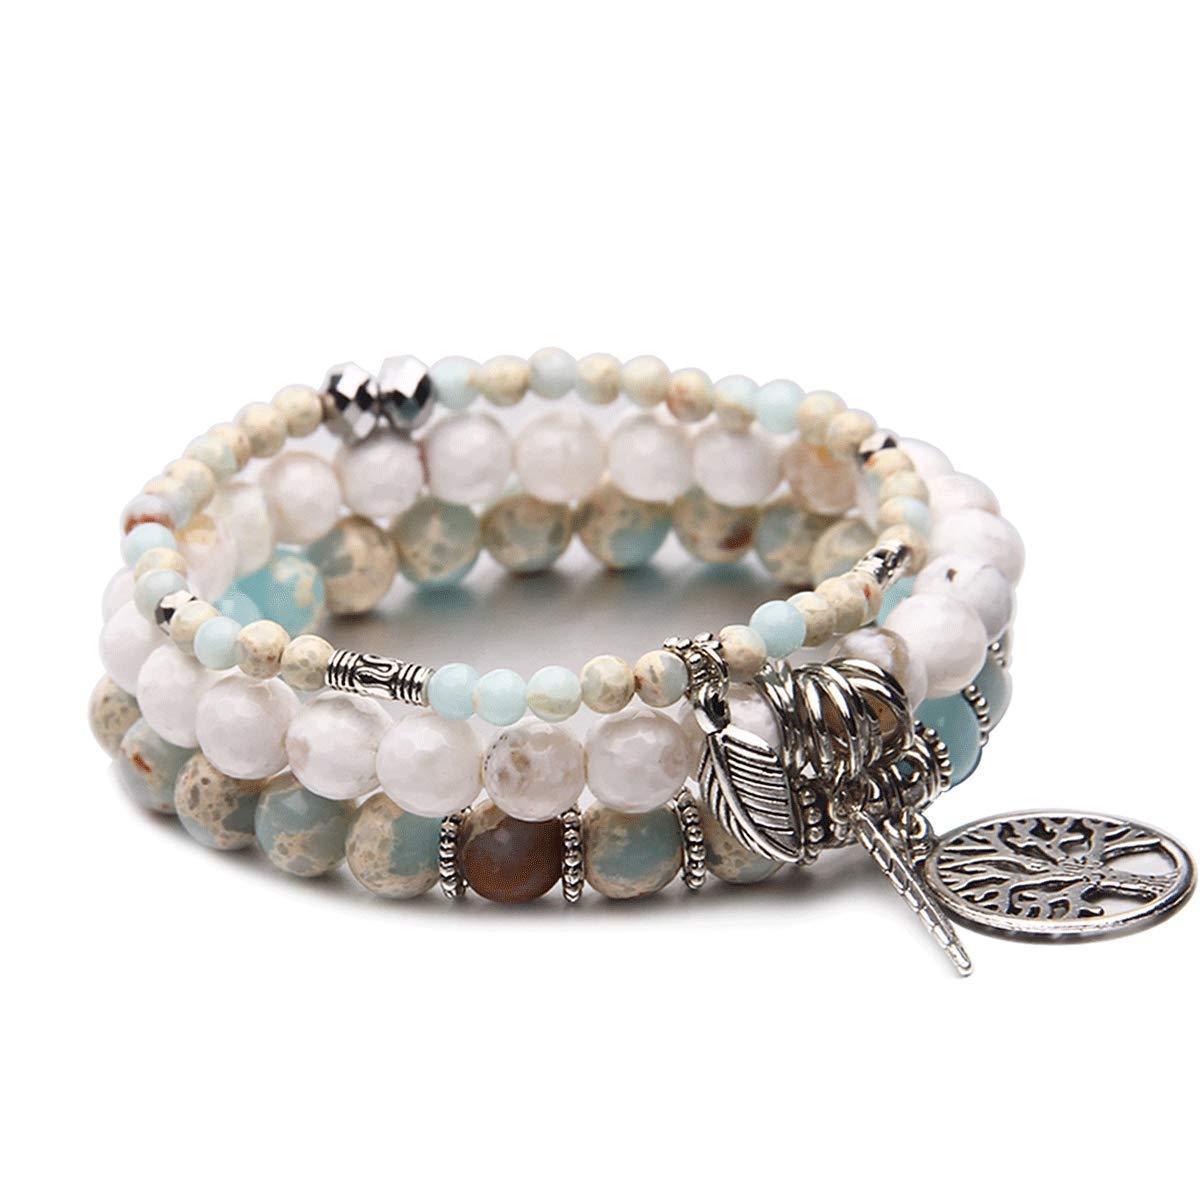 Tree of Life Turquoise Jasper & Tibetan Agate Gemstone Chakra Beaded Bracelet | Beach Charm Bracelet Set - Ocean Jewelry (Sky Blue) by Jardme